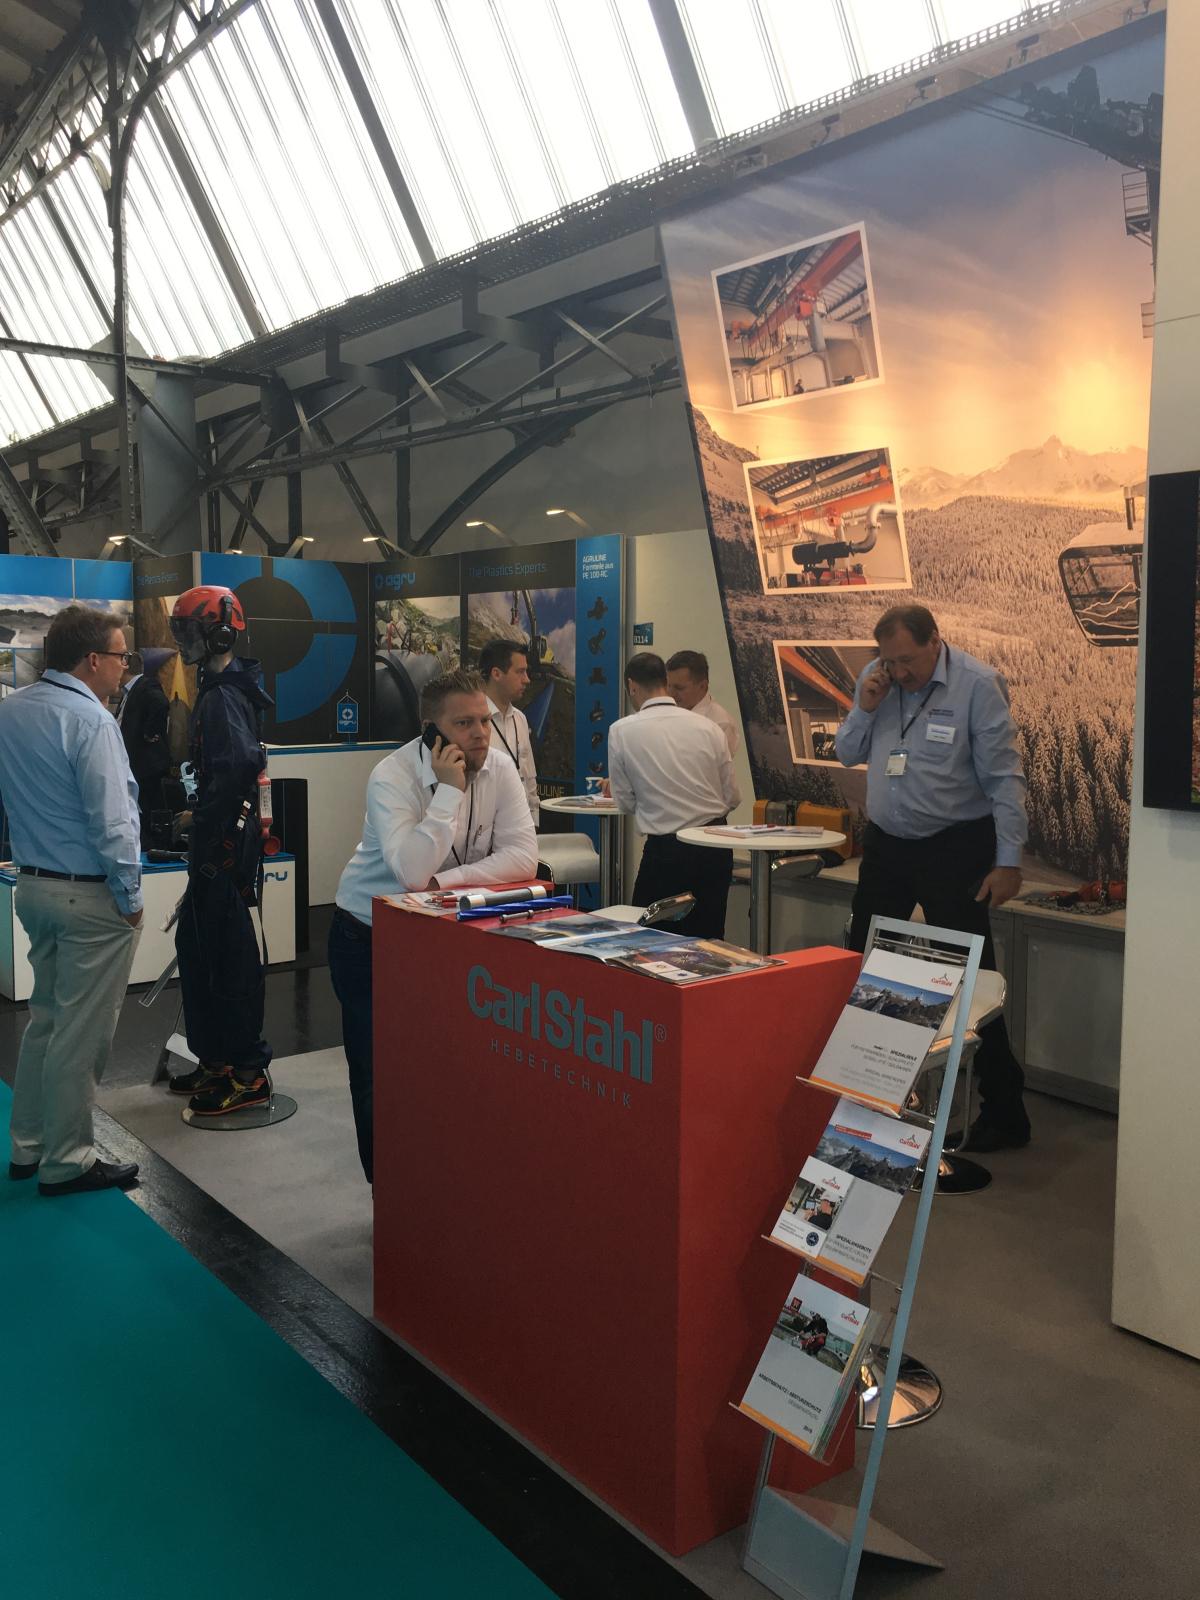 Carl Stahl at Interalpin 2019 - A trade fair follow-up report